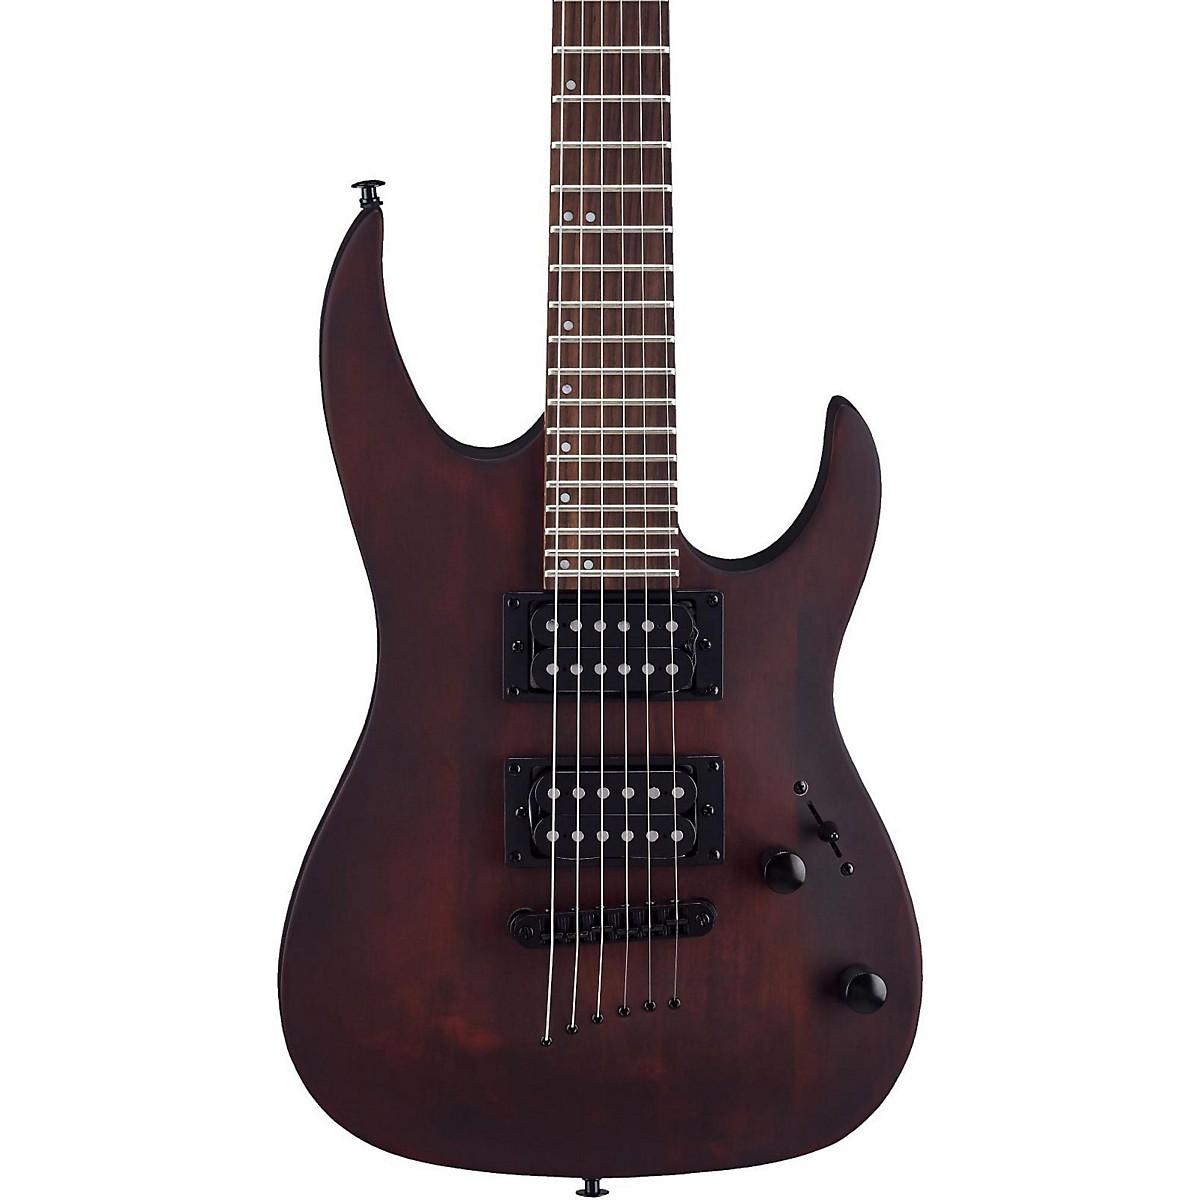 Mitchell MM100 Mini Double Cutaway Electric Guitar